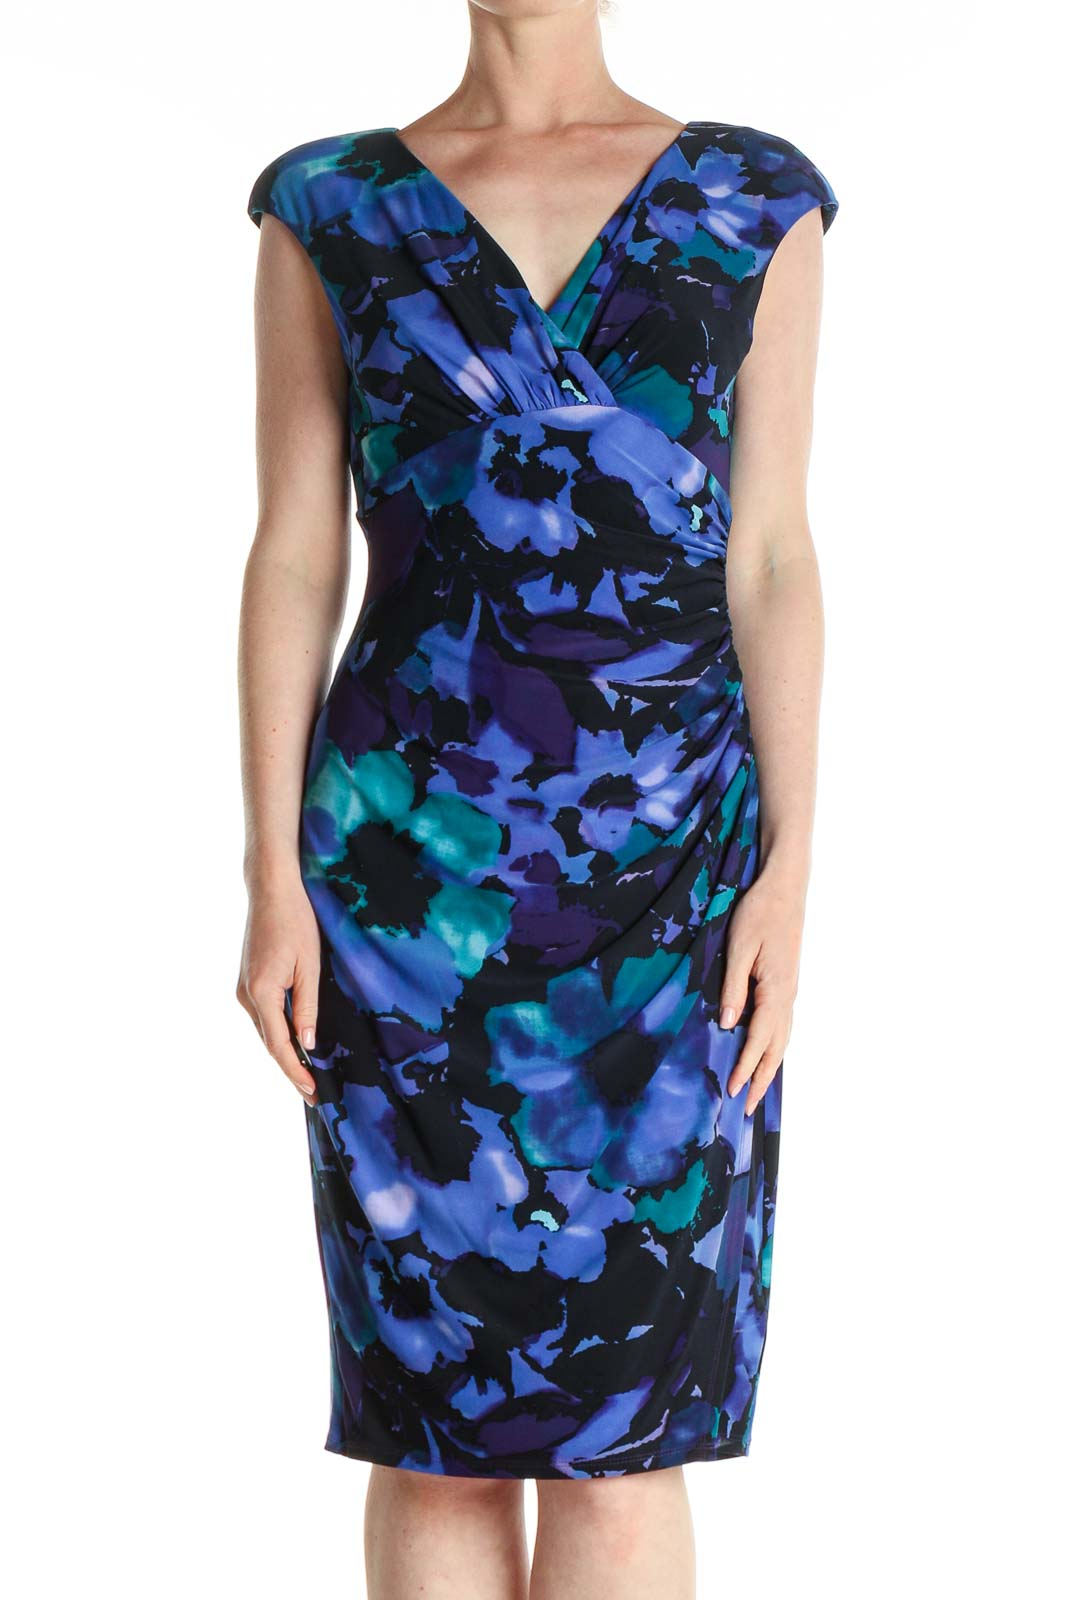 Blue Floral Print Work Sheath Dress Front